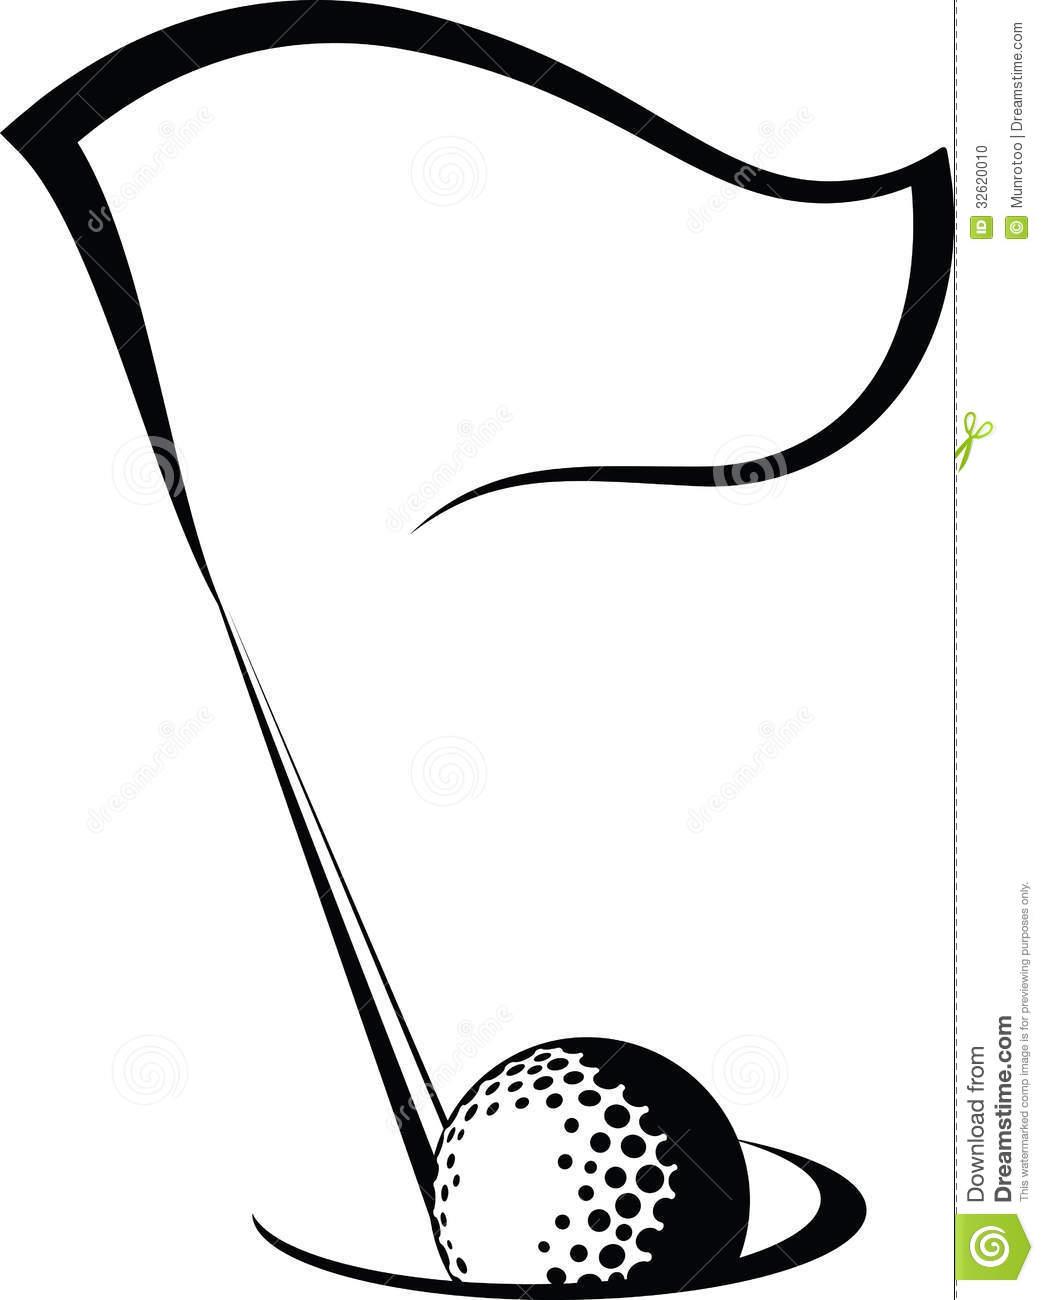 Golf Clipart Black And White Clipart Panda